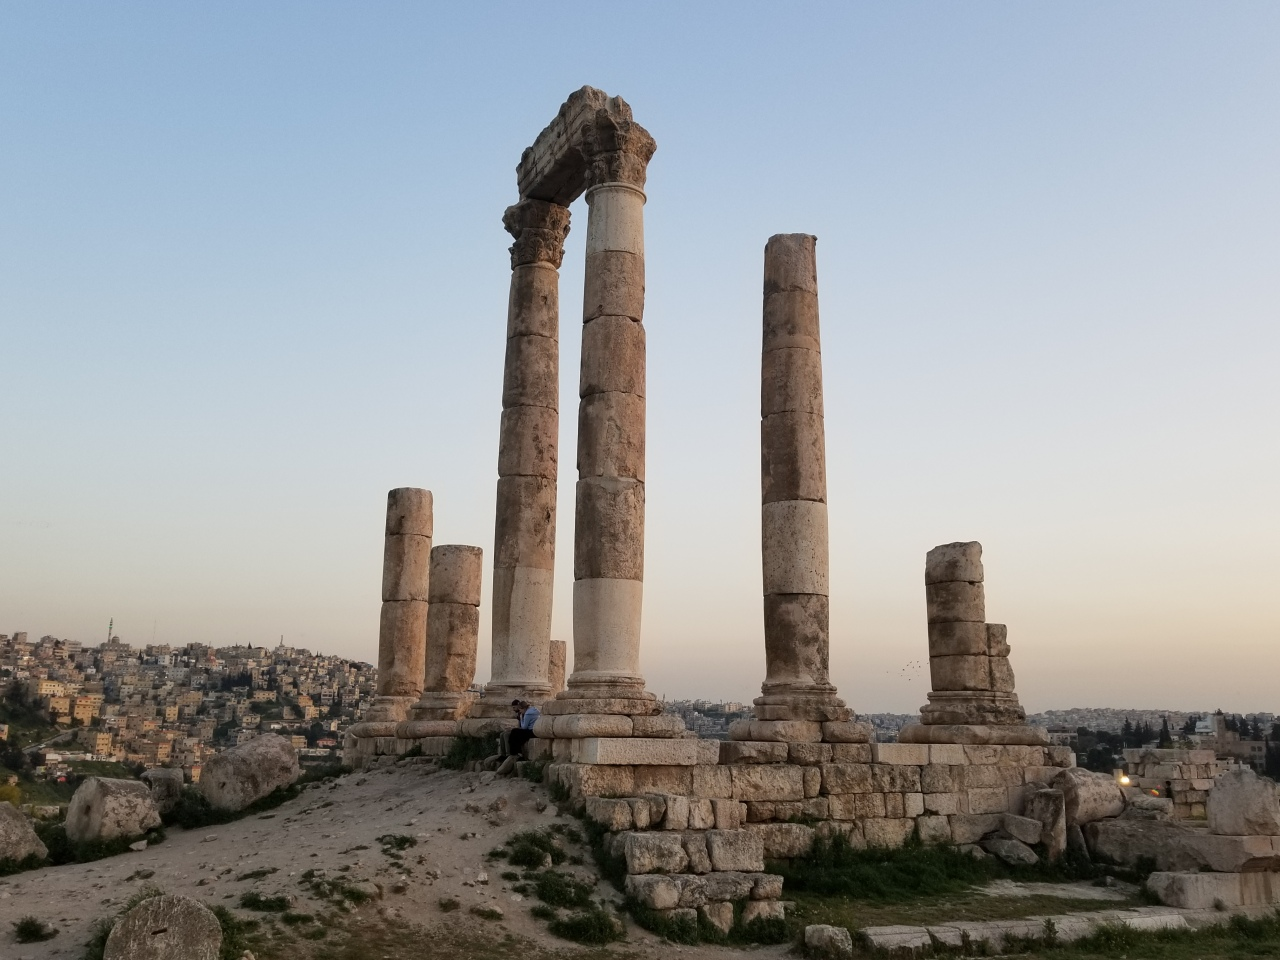 Day 12: Amman,Jordan